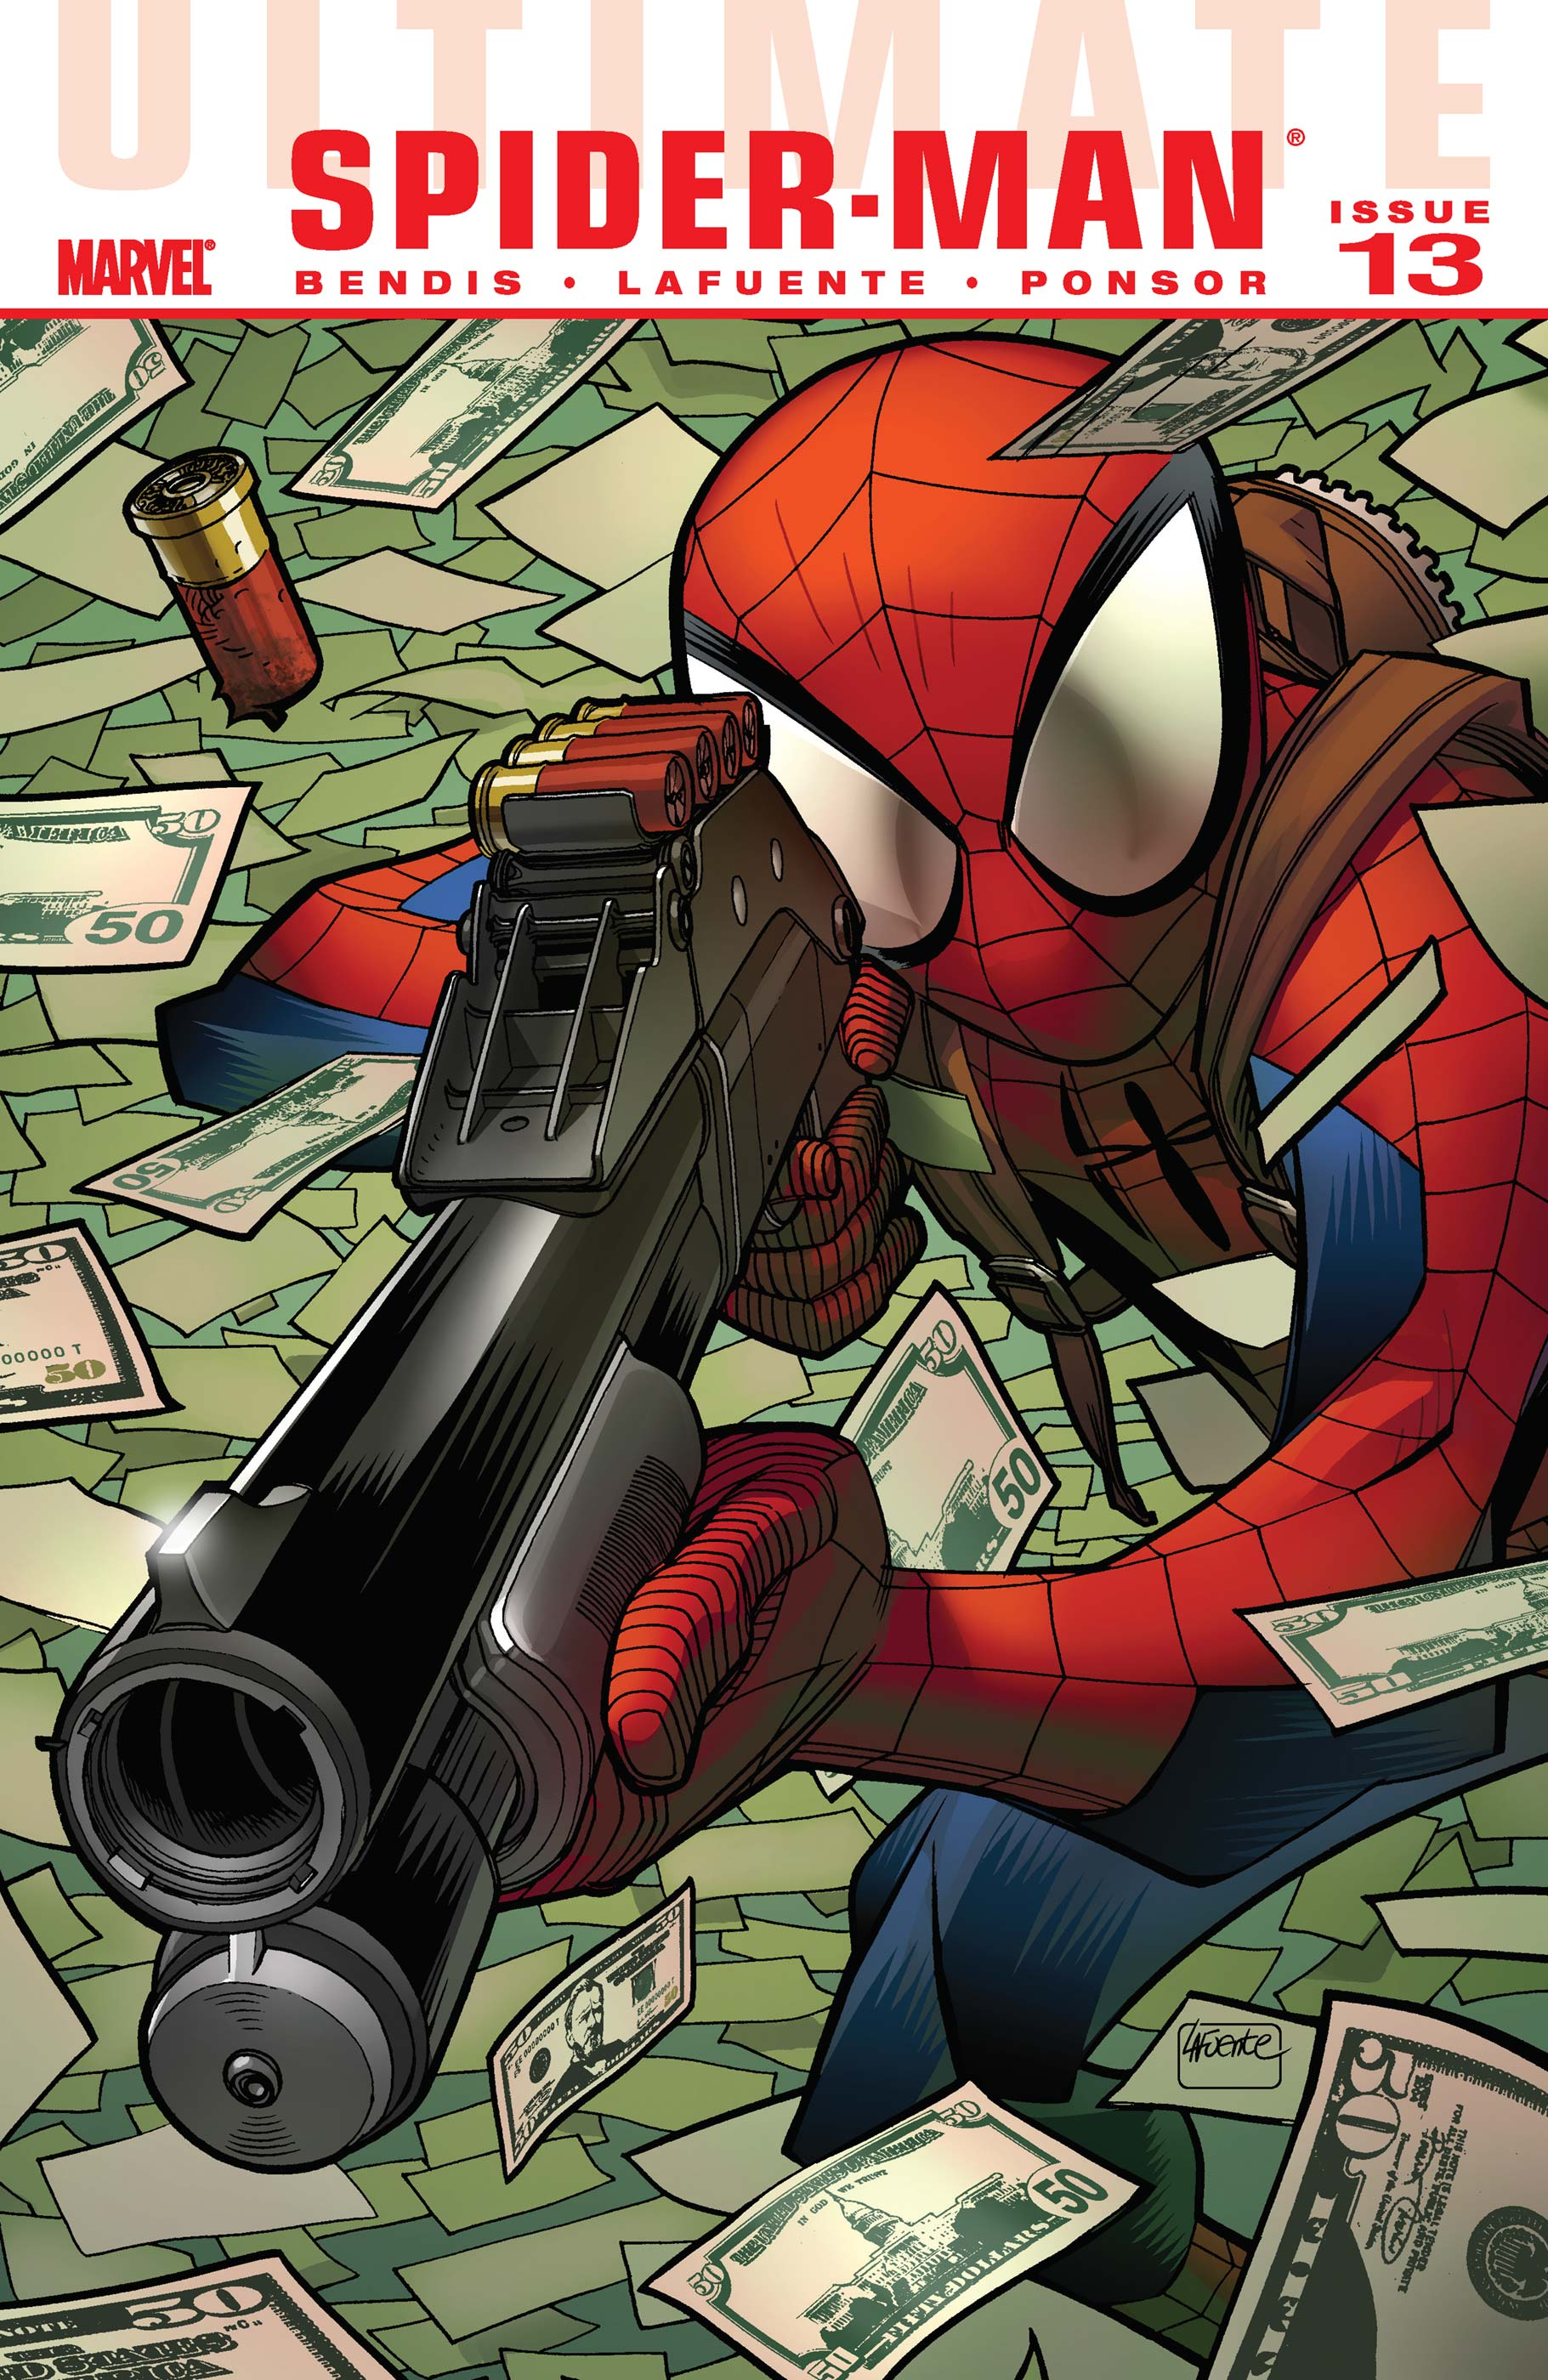 Ultimate Comics Spider-Man (2009) #13